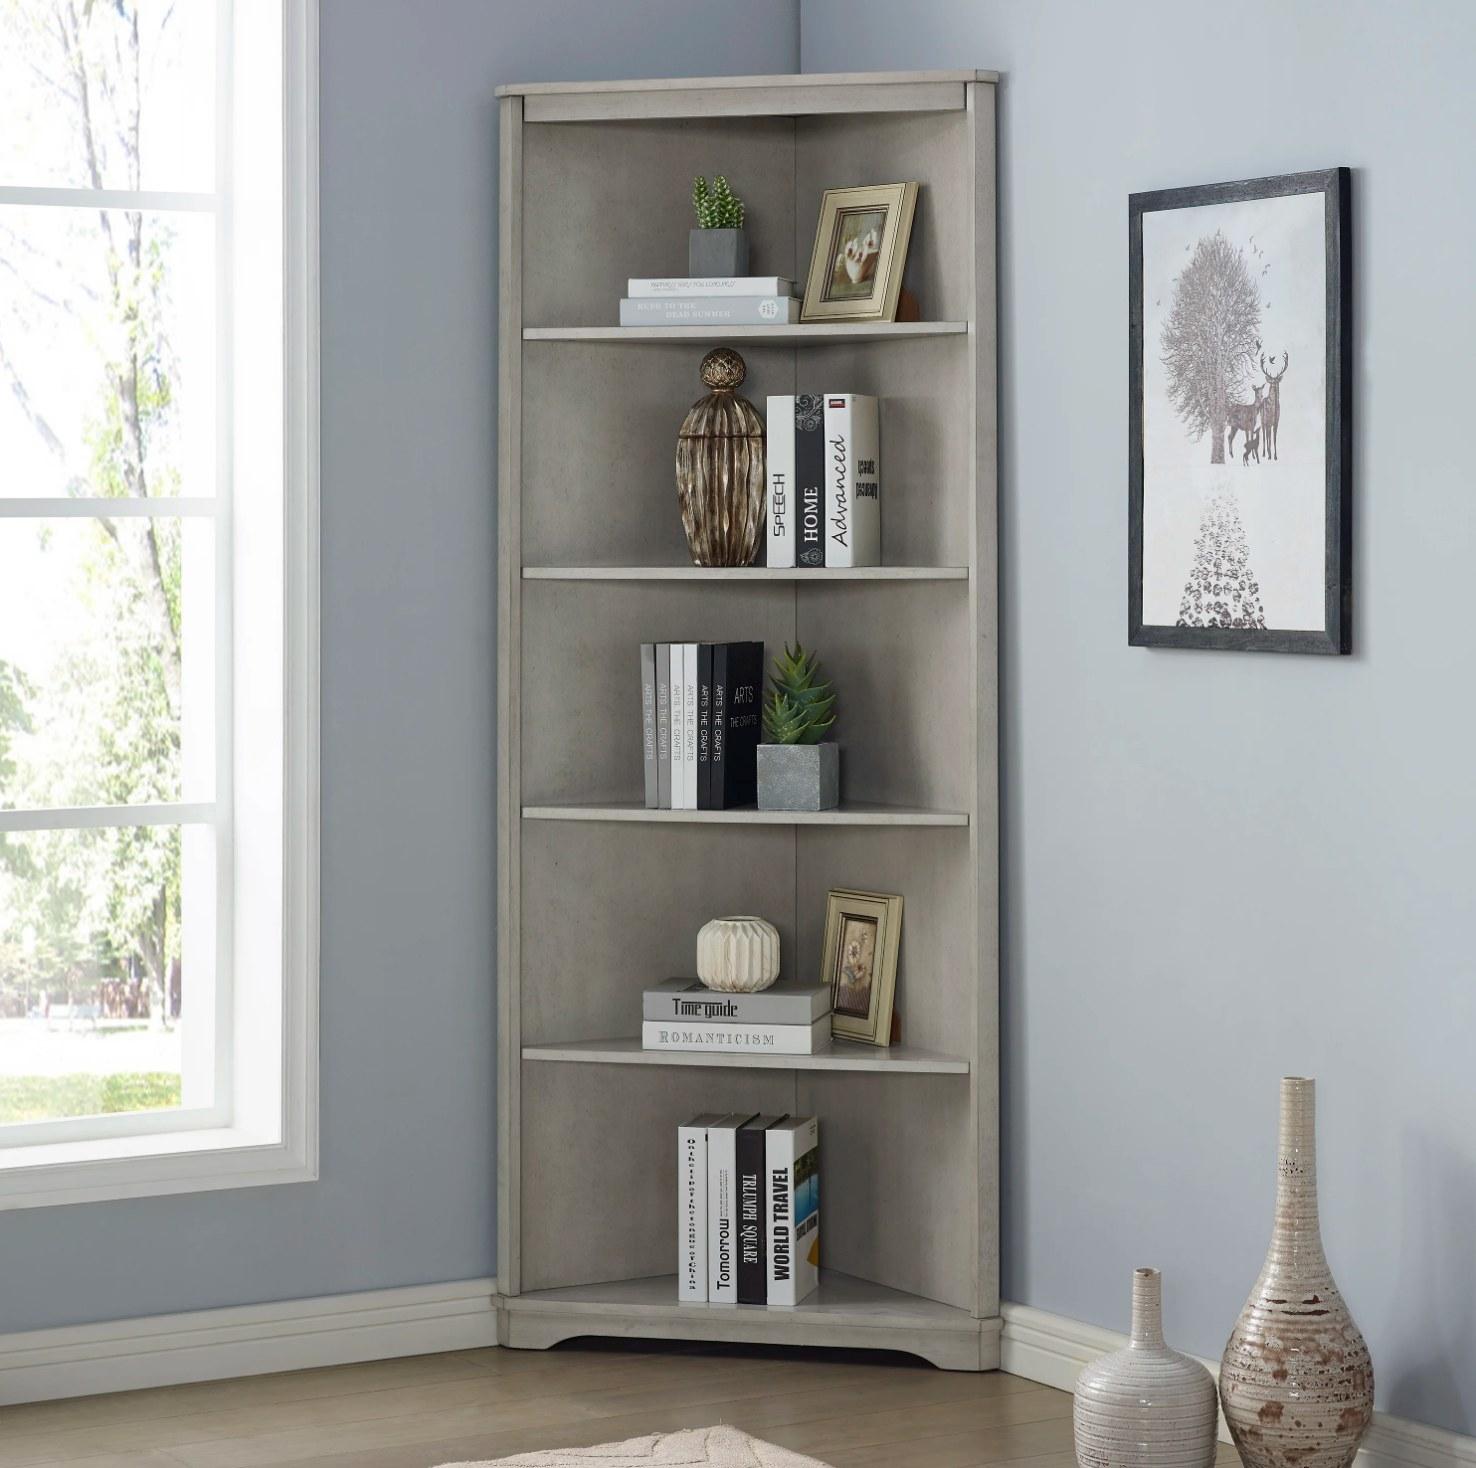 The bookcase in antique white